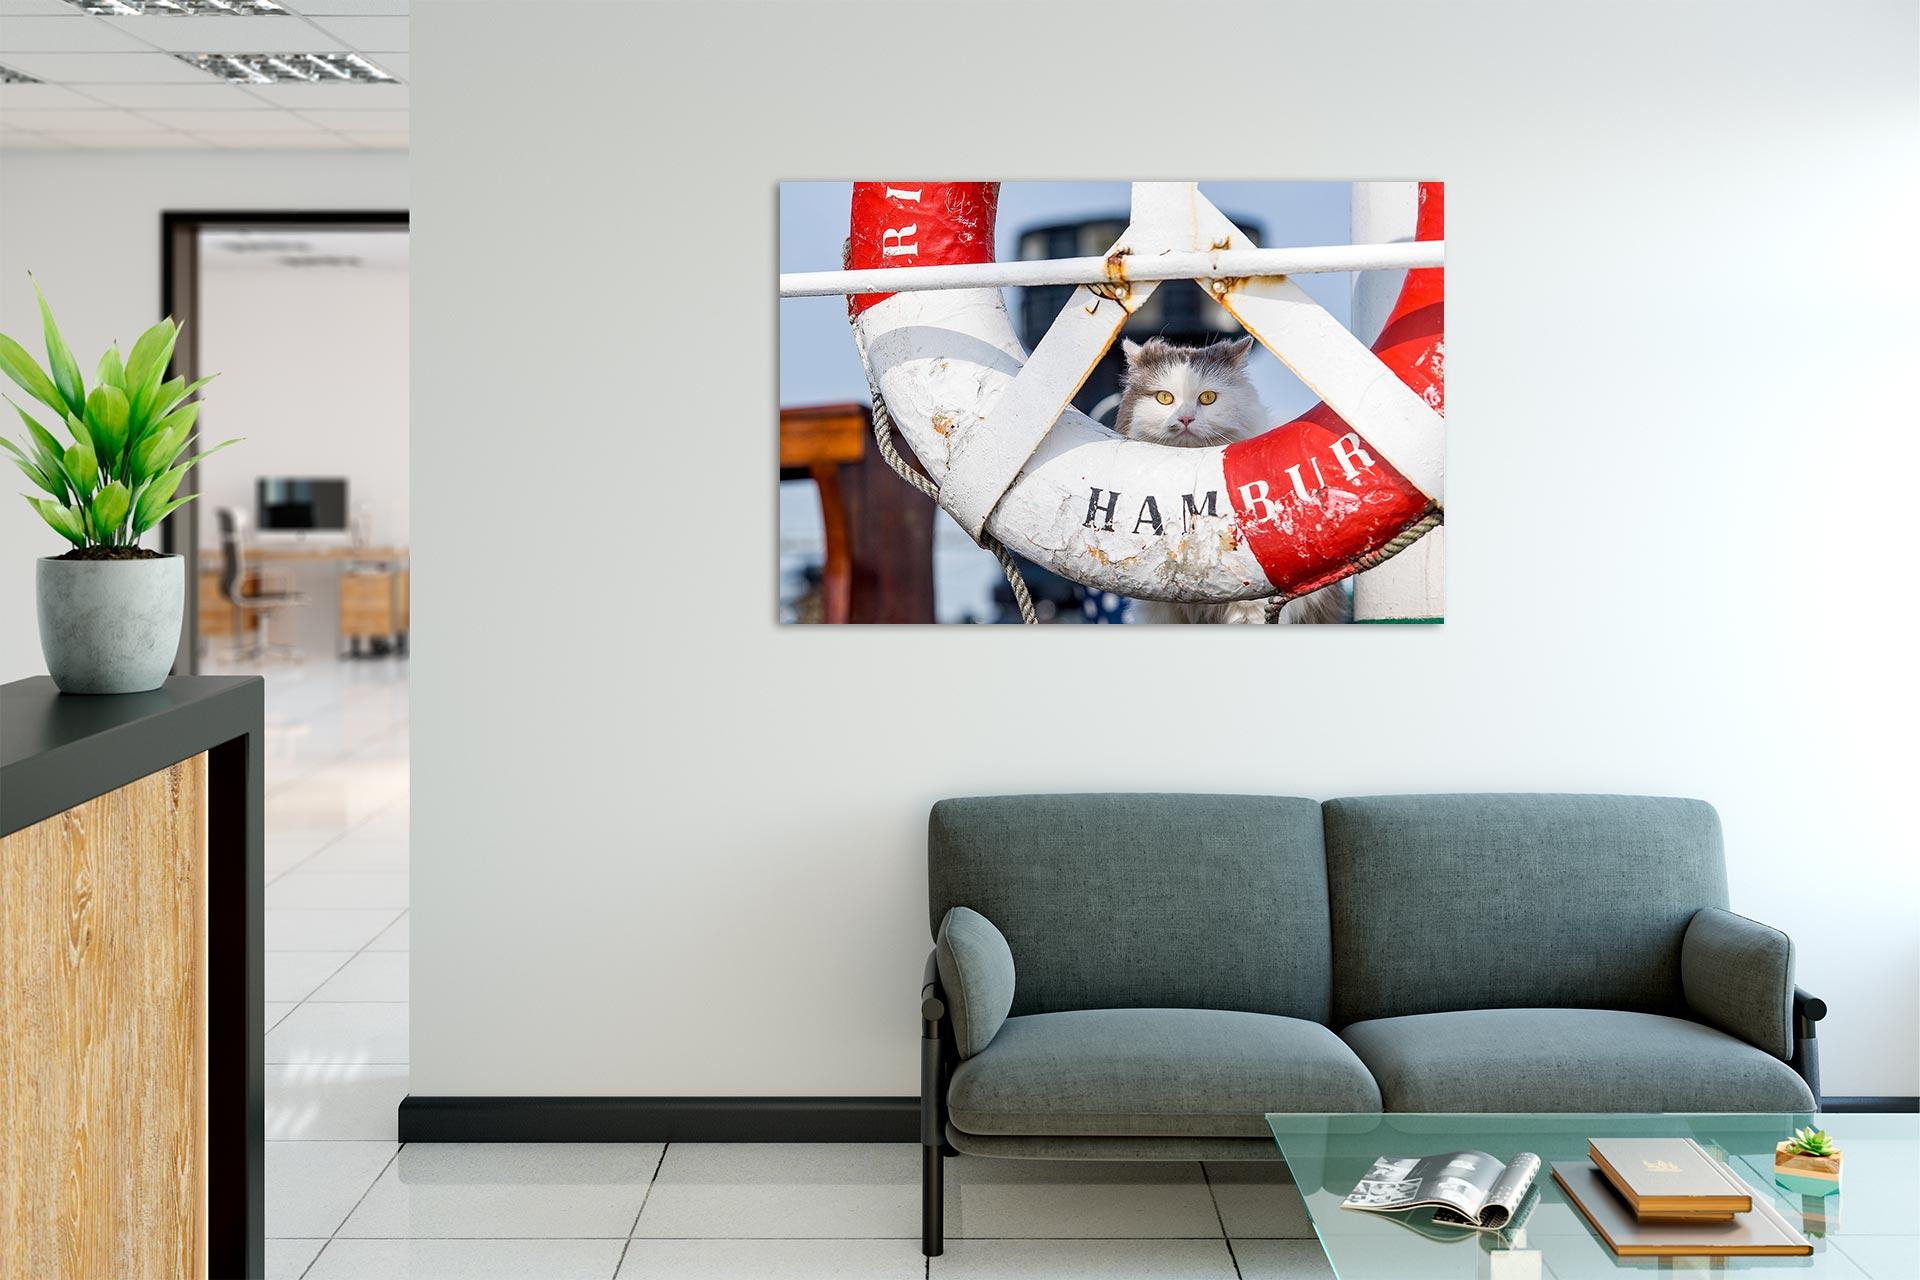 NL076-simon-hamburg-wandbild-bild-auf-leinwand-acrylglas-aludibond-empfang